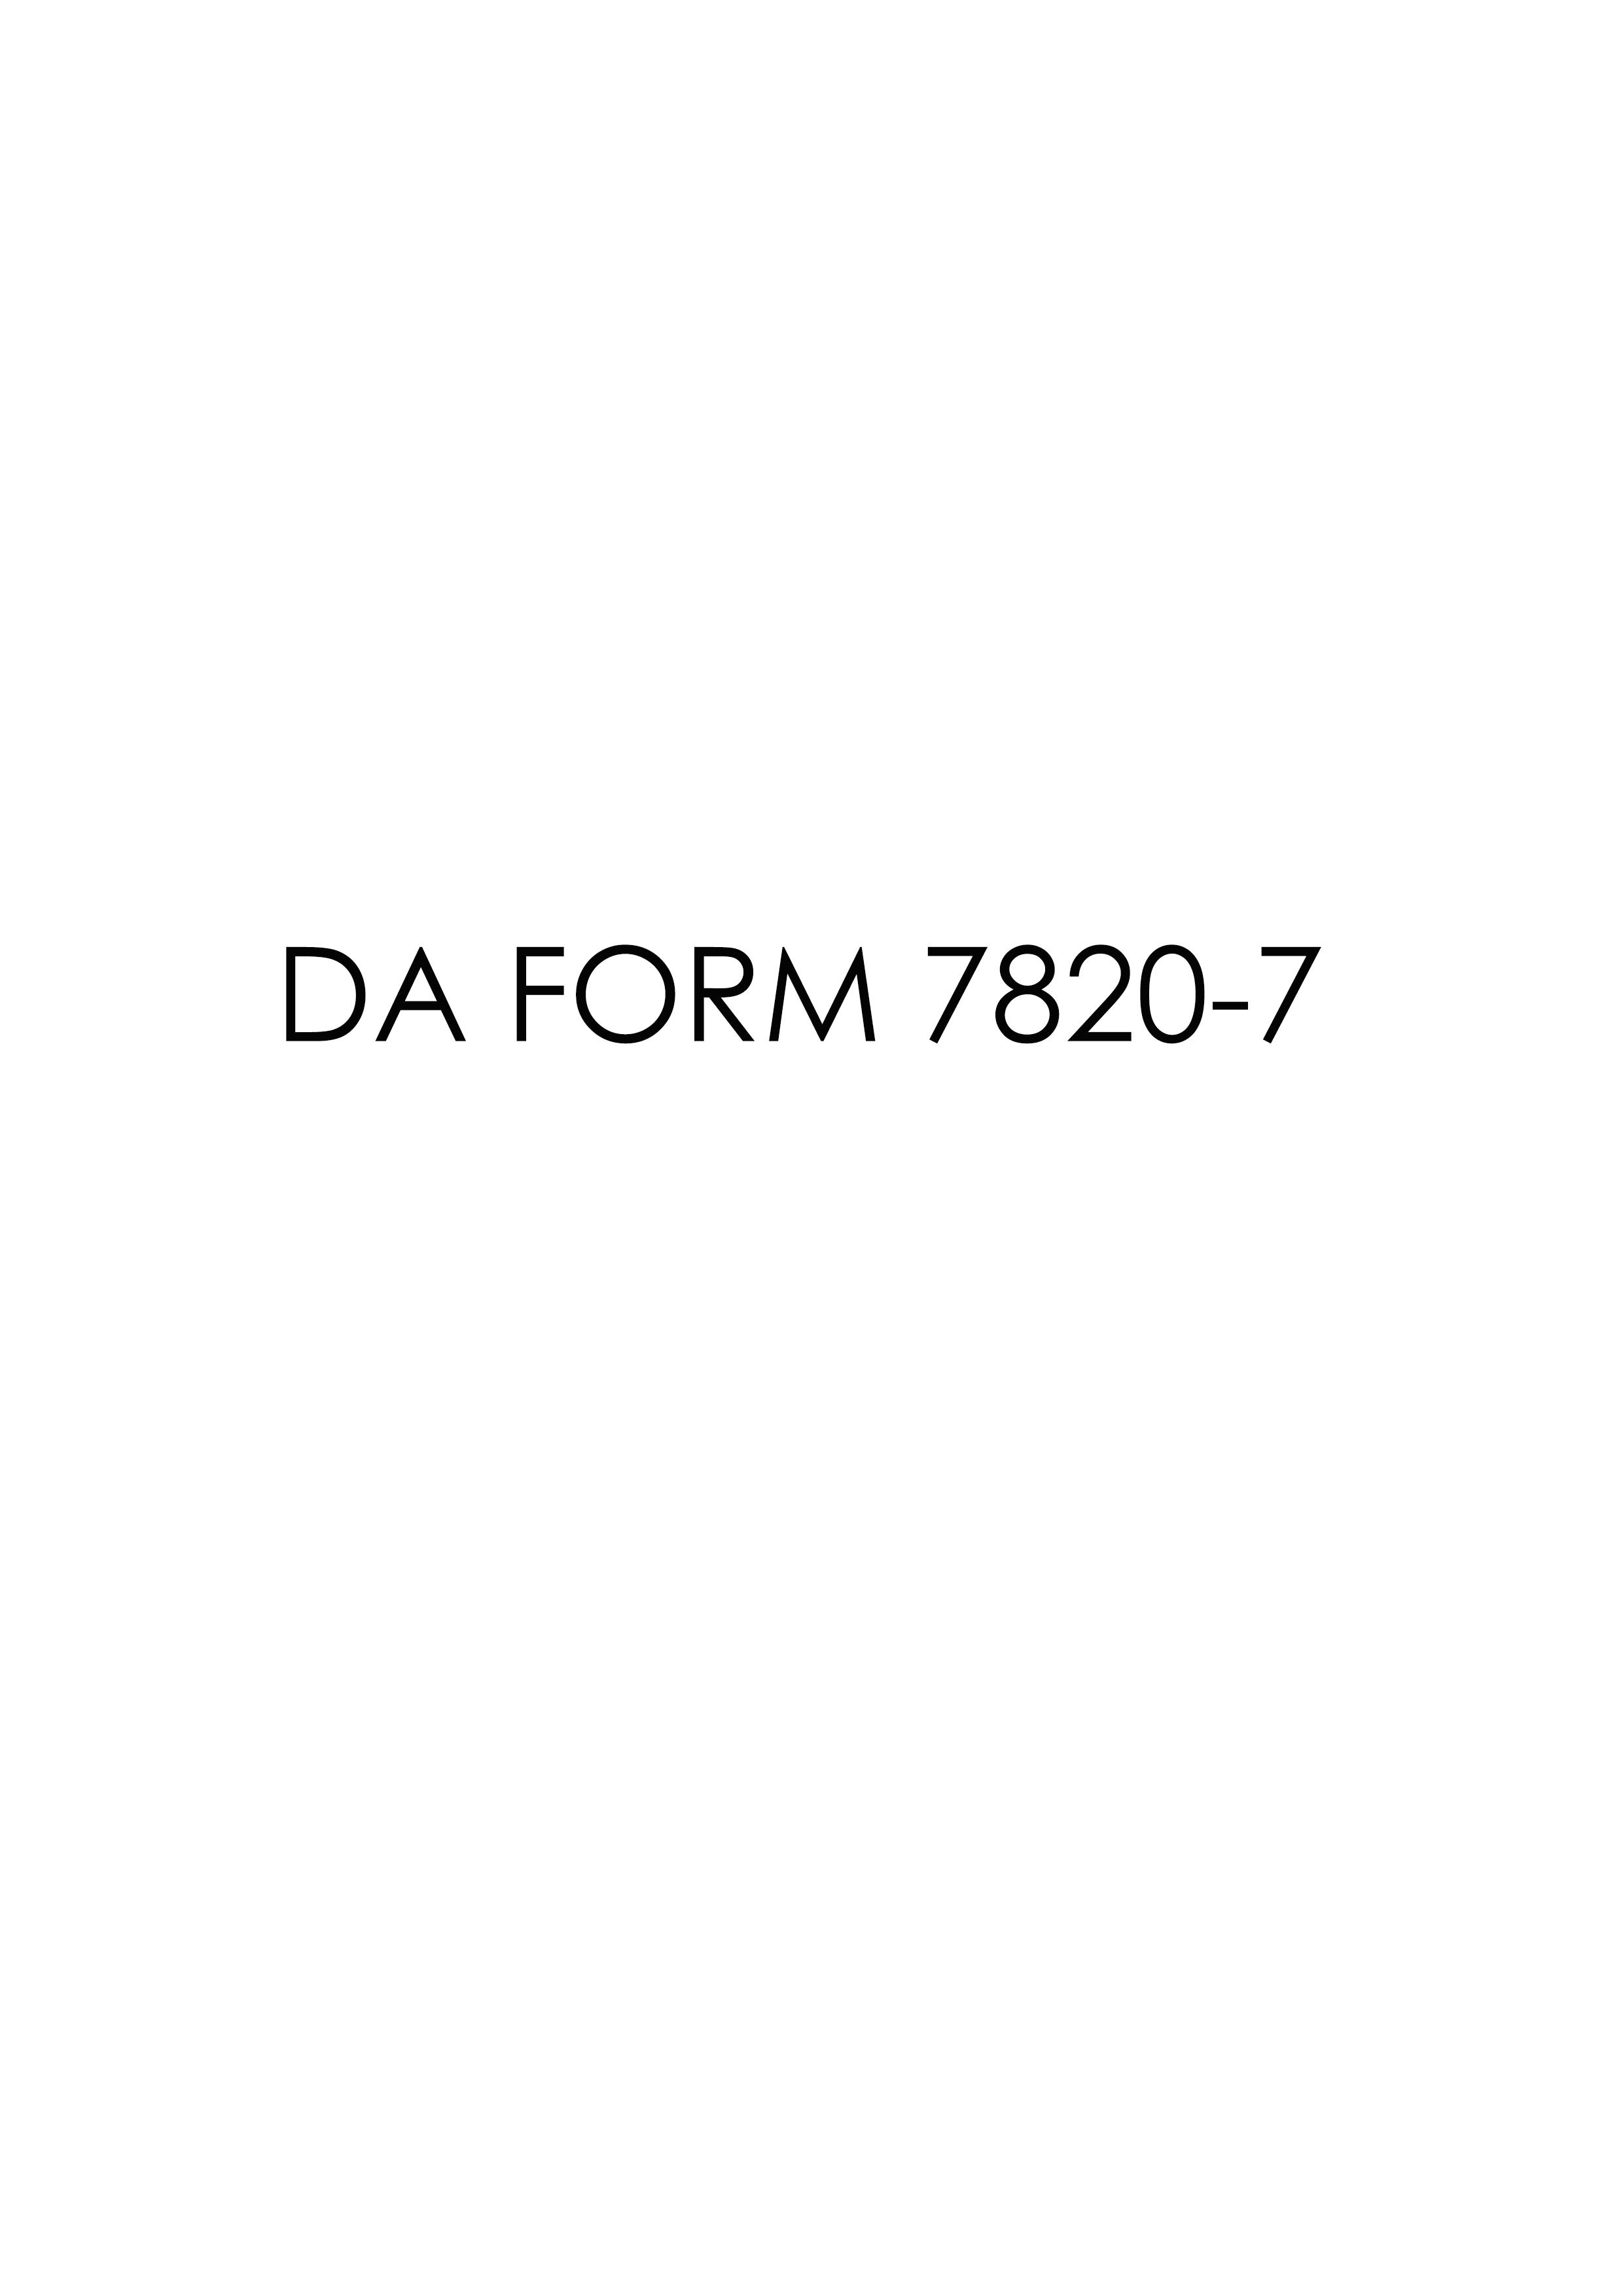 Download da Form 7820-7 Free